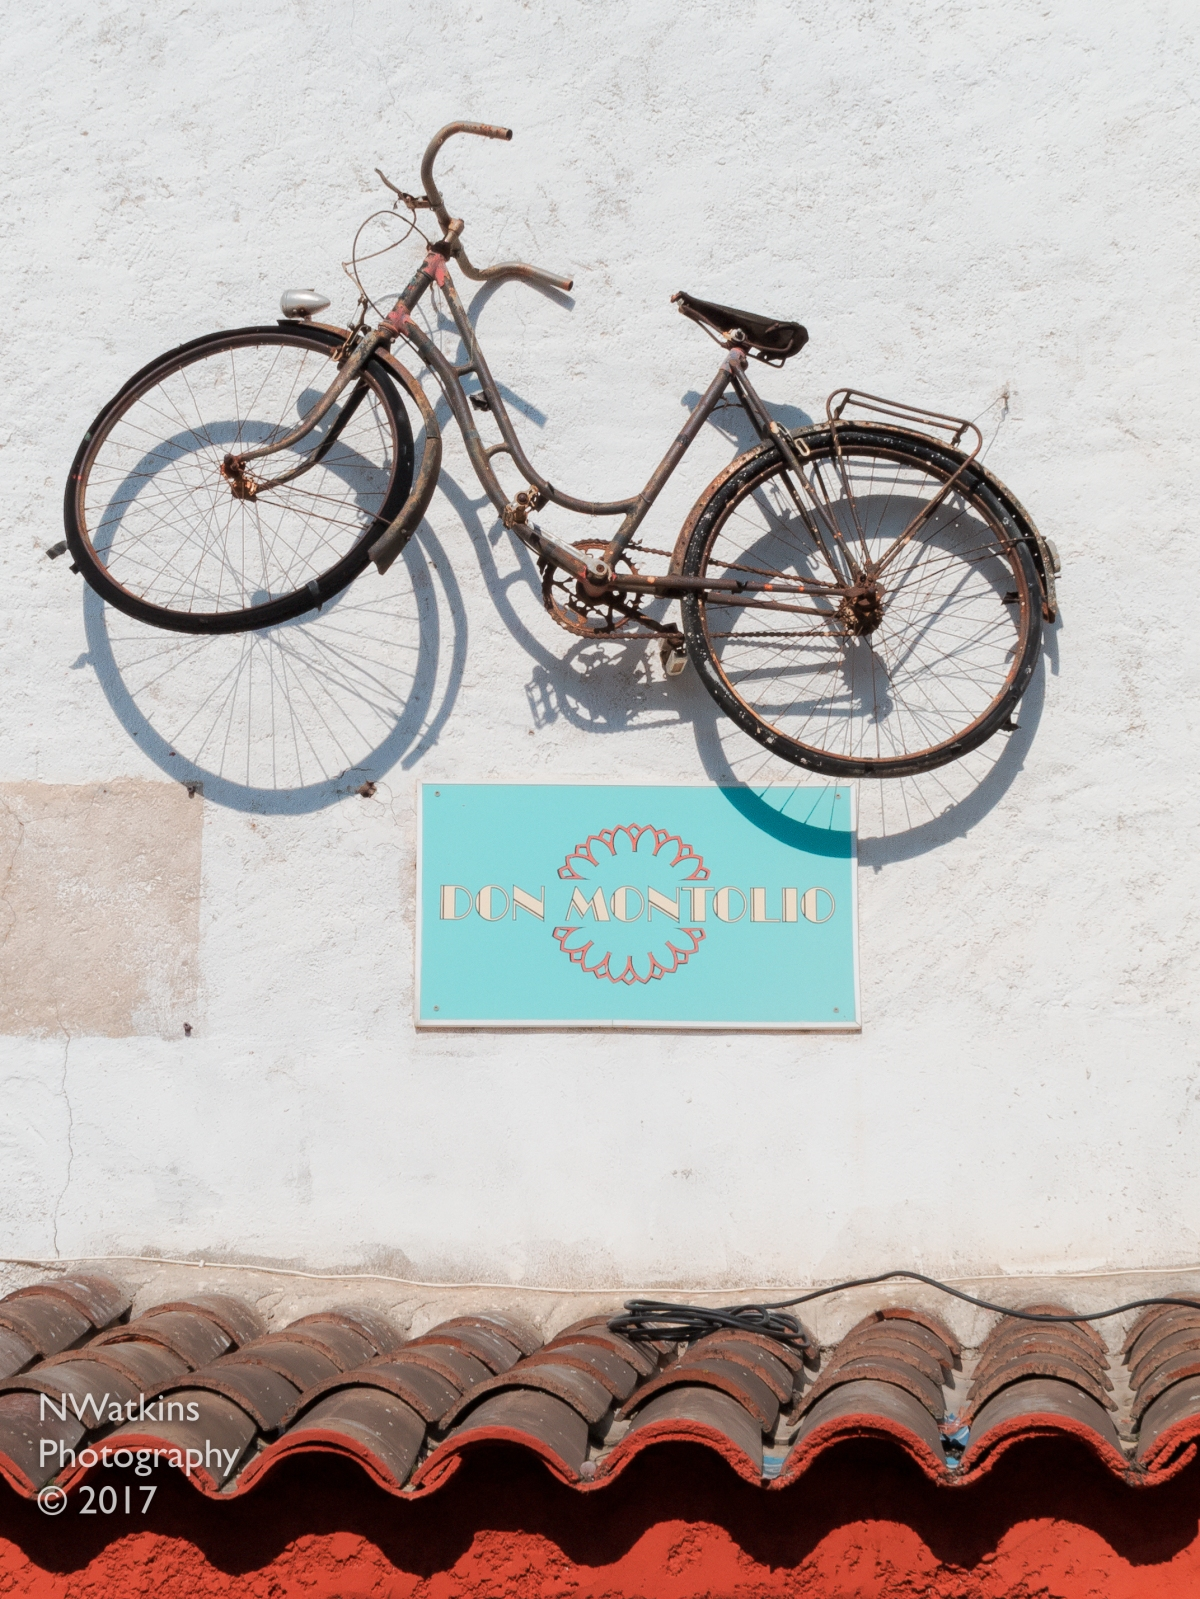 bicycle don montolio cw